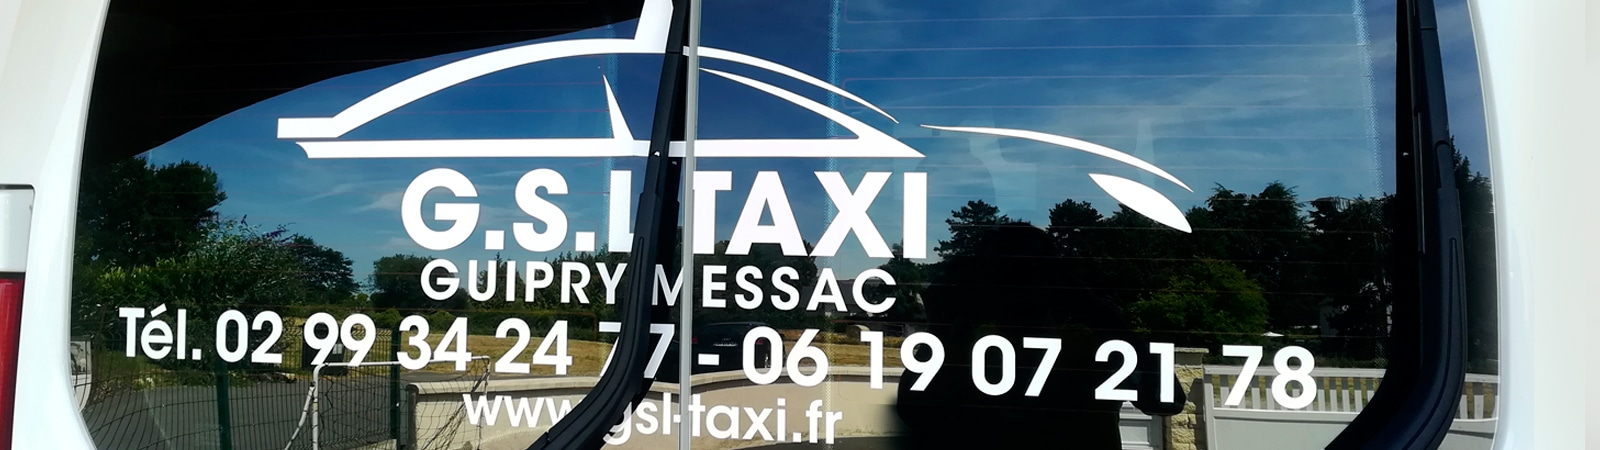 taxi guipry messac